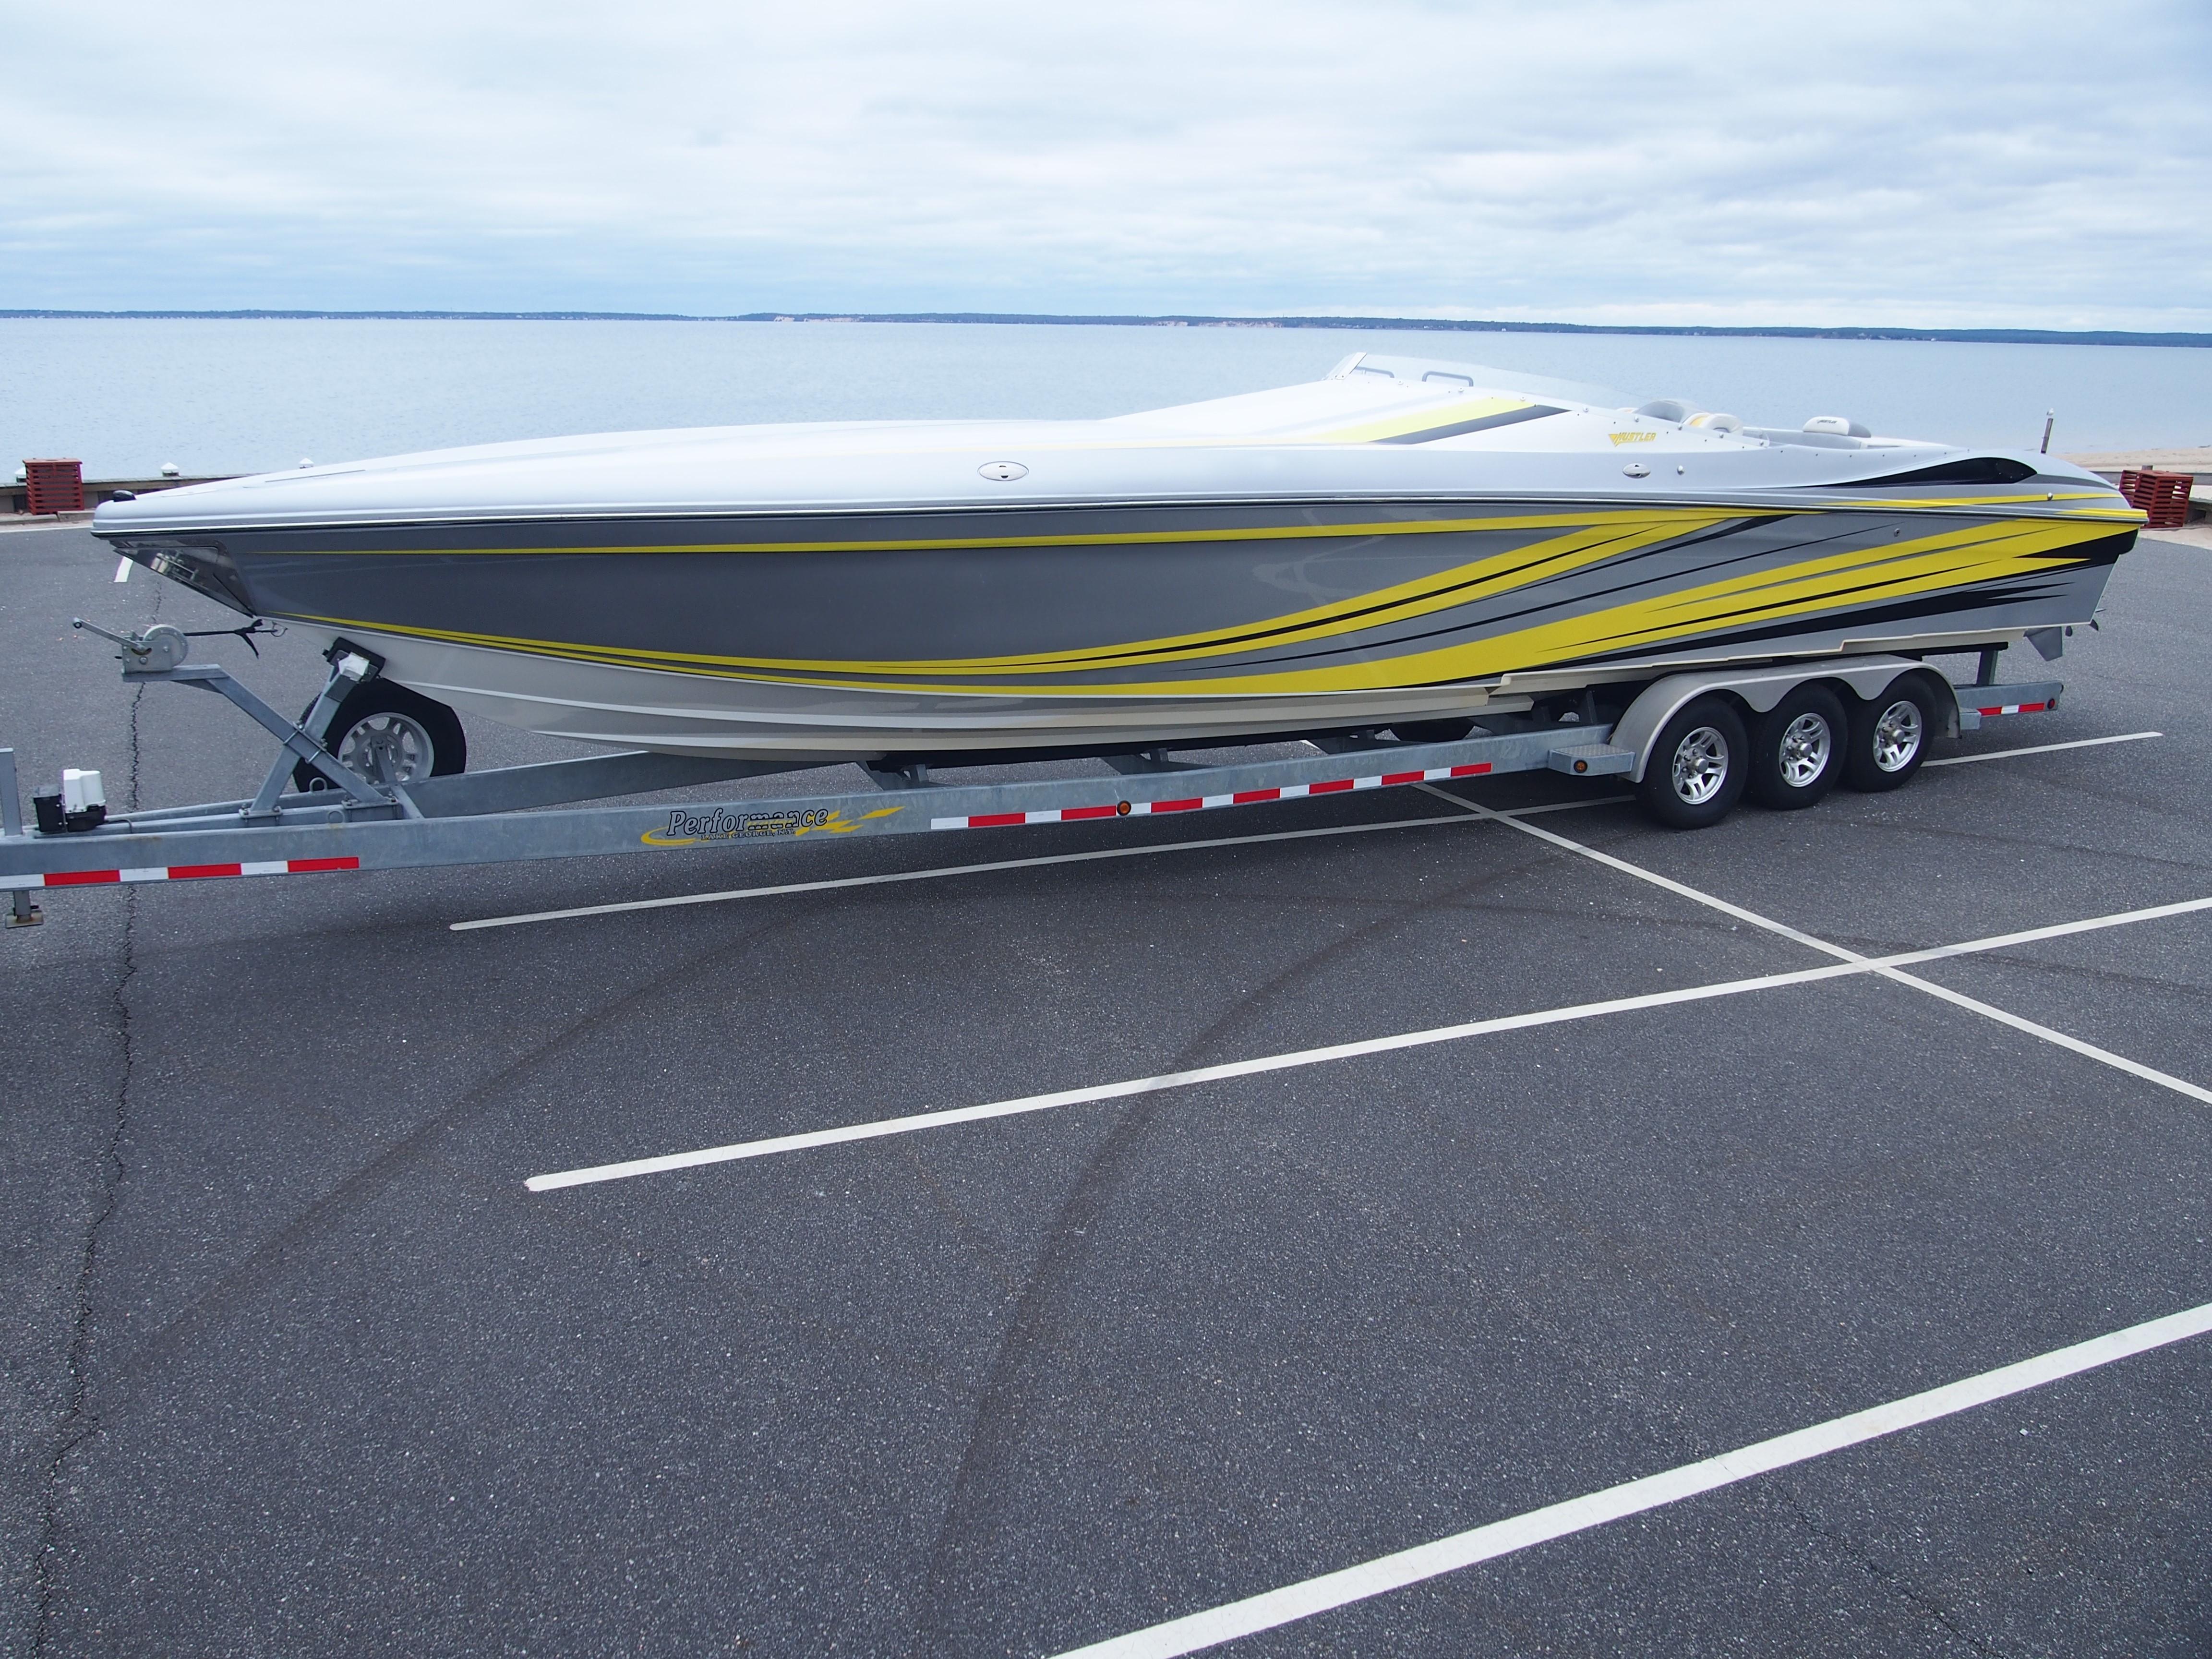 Idea Hustler 377 powerboat for sale